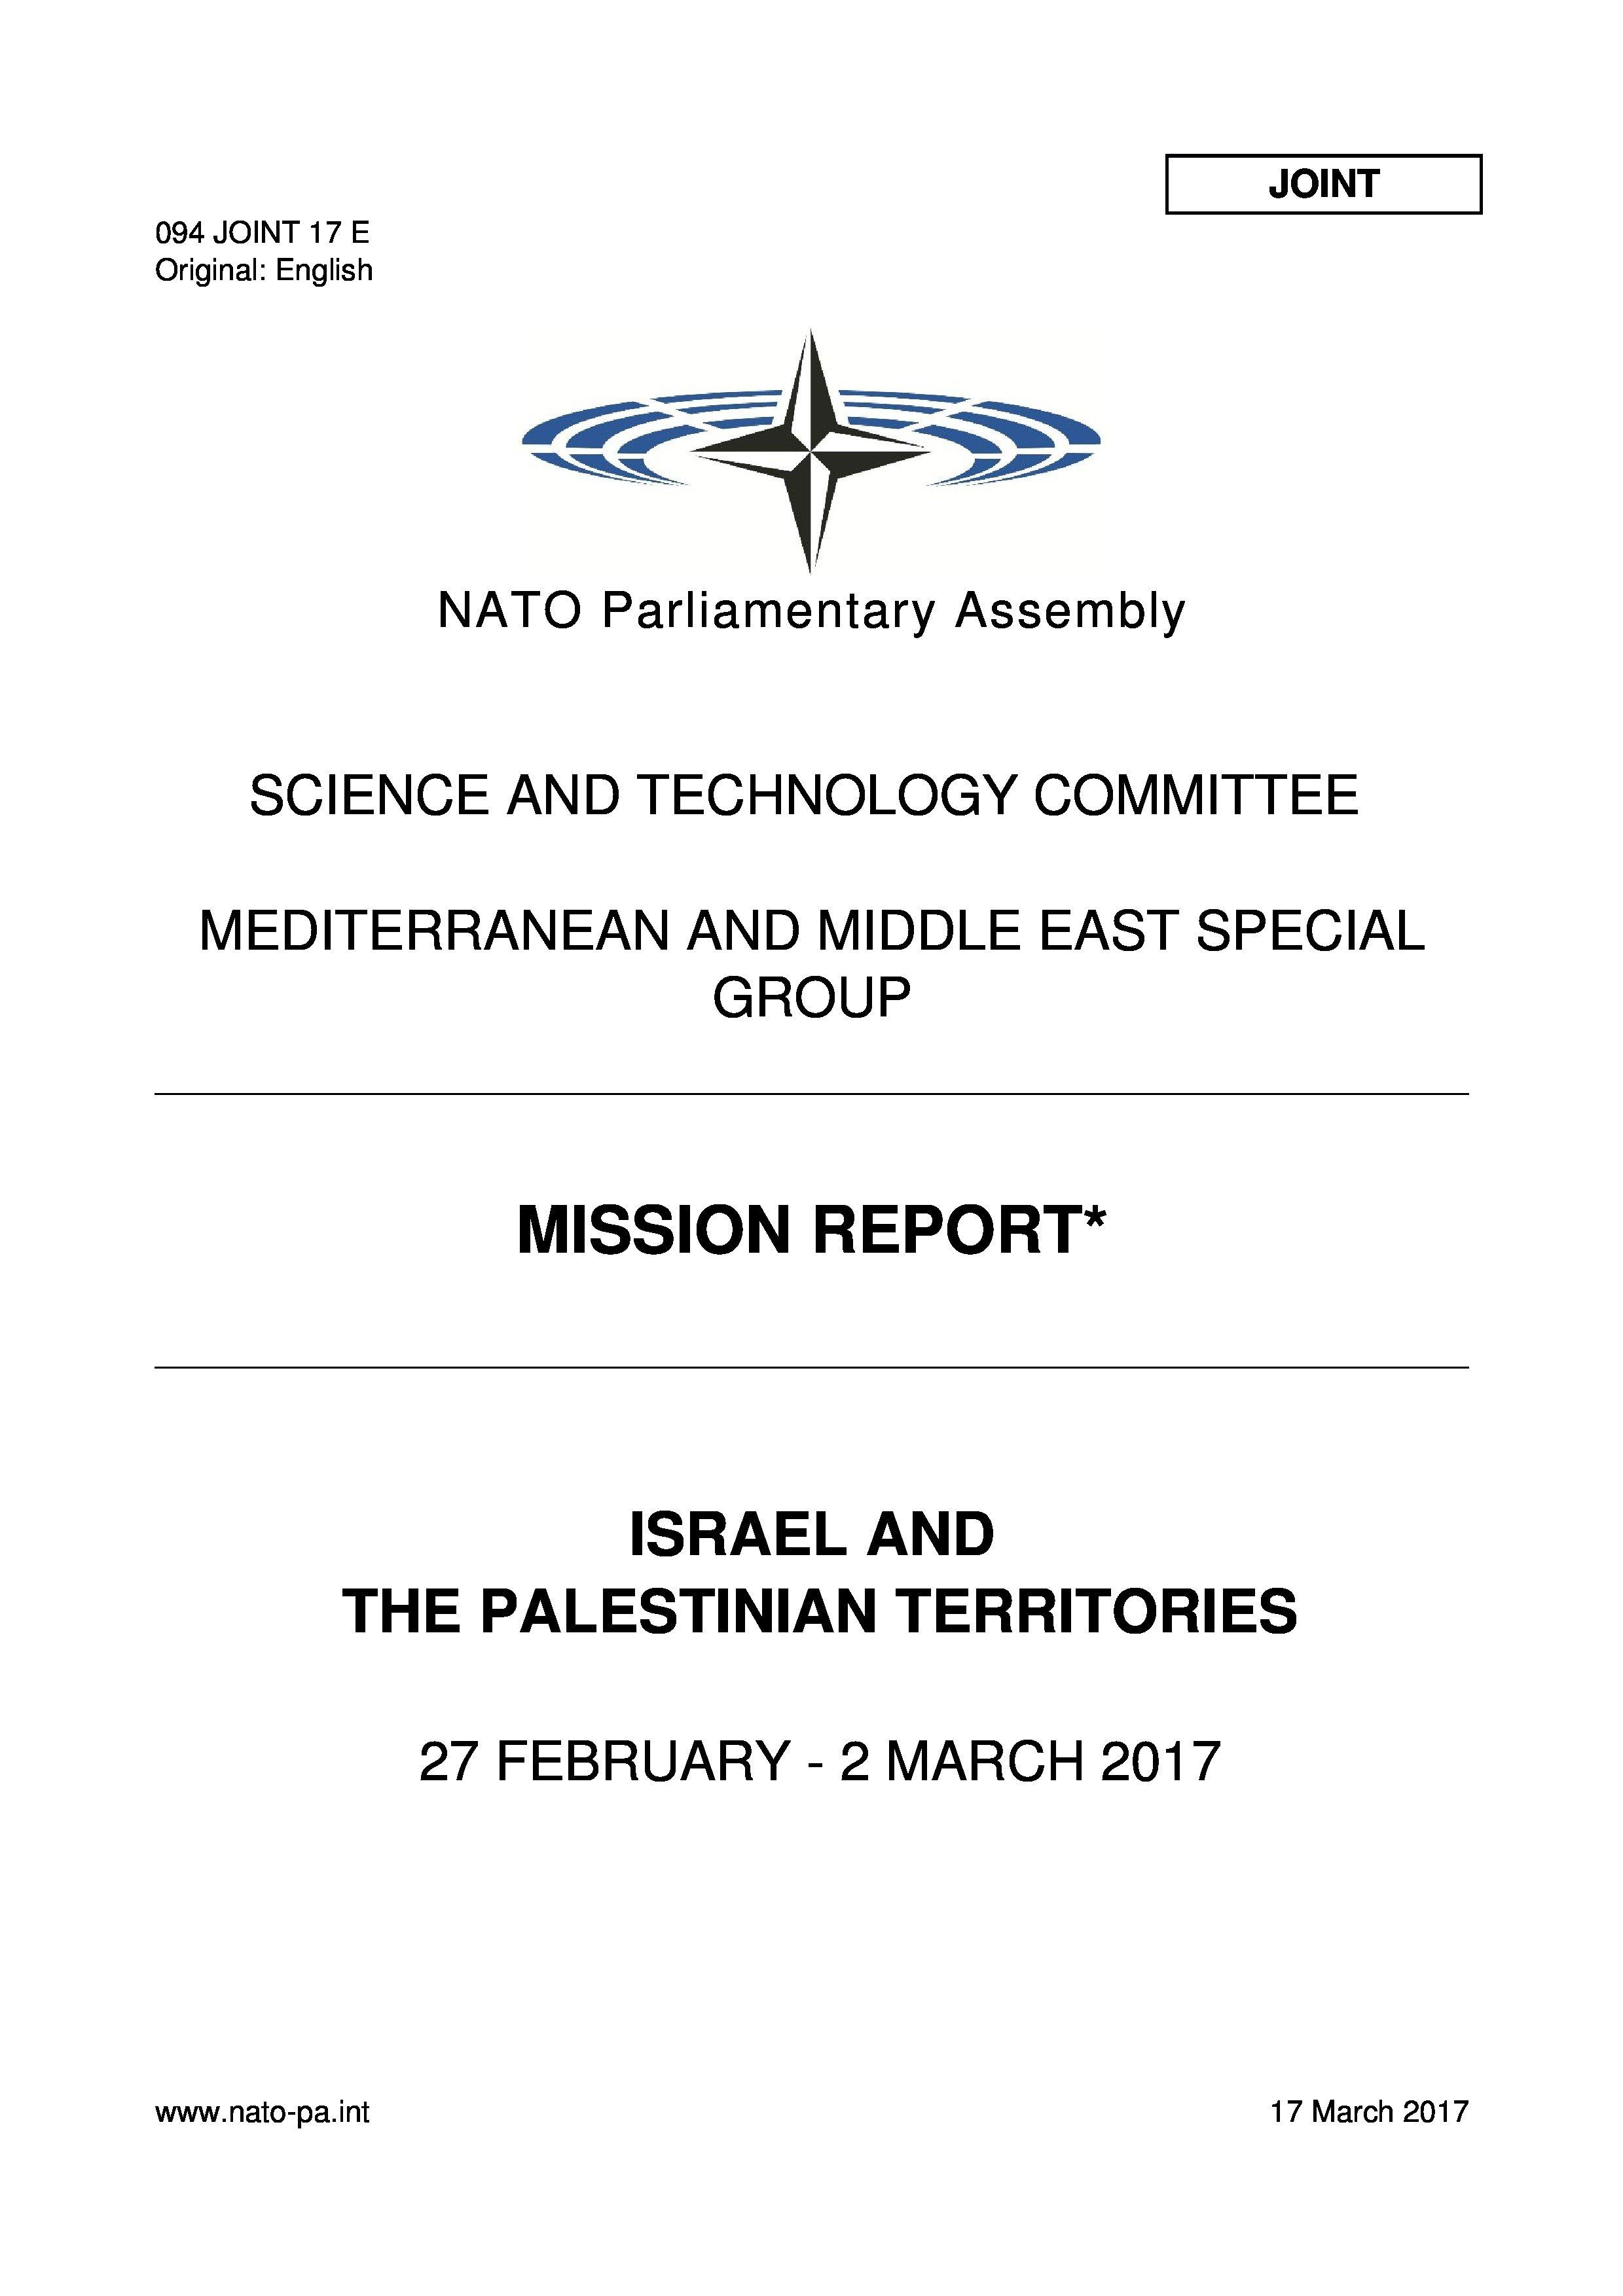 Documents | NATO PA